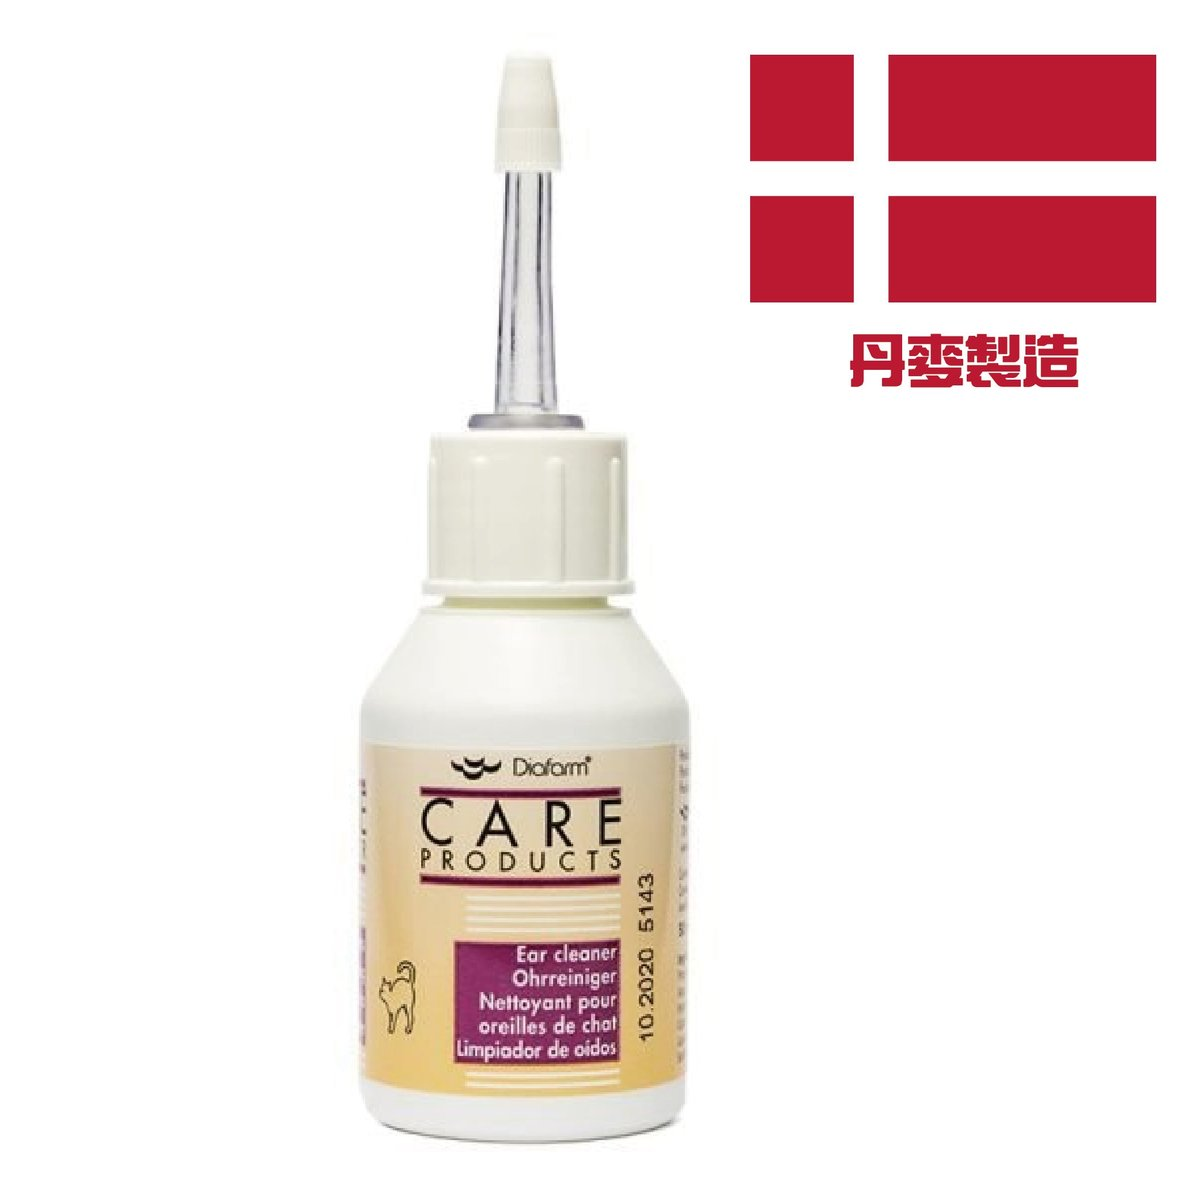 Cat Ear Cleaner 50ml (ST-18454), manufactured in Denmark